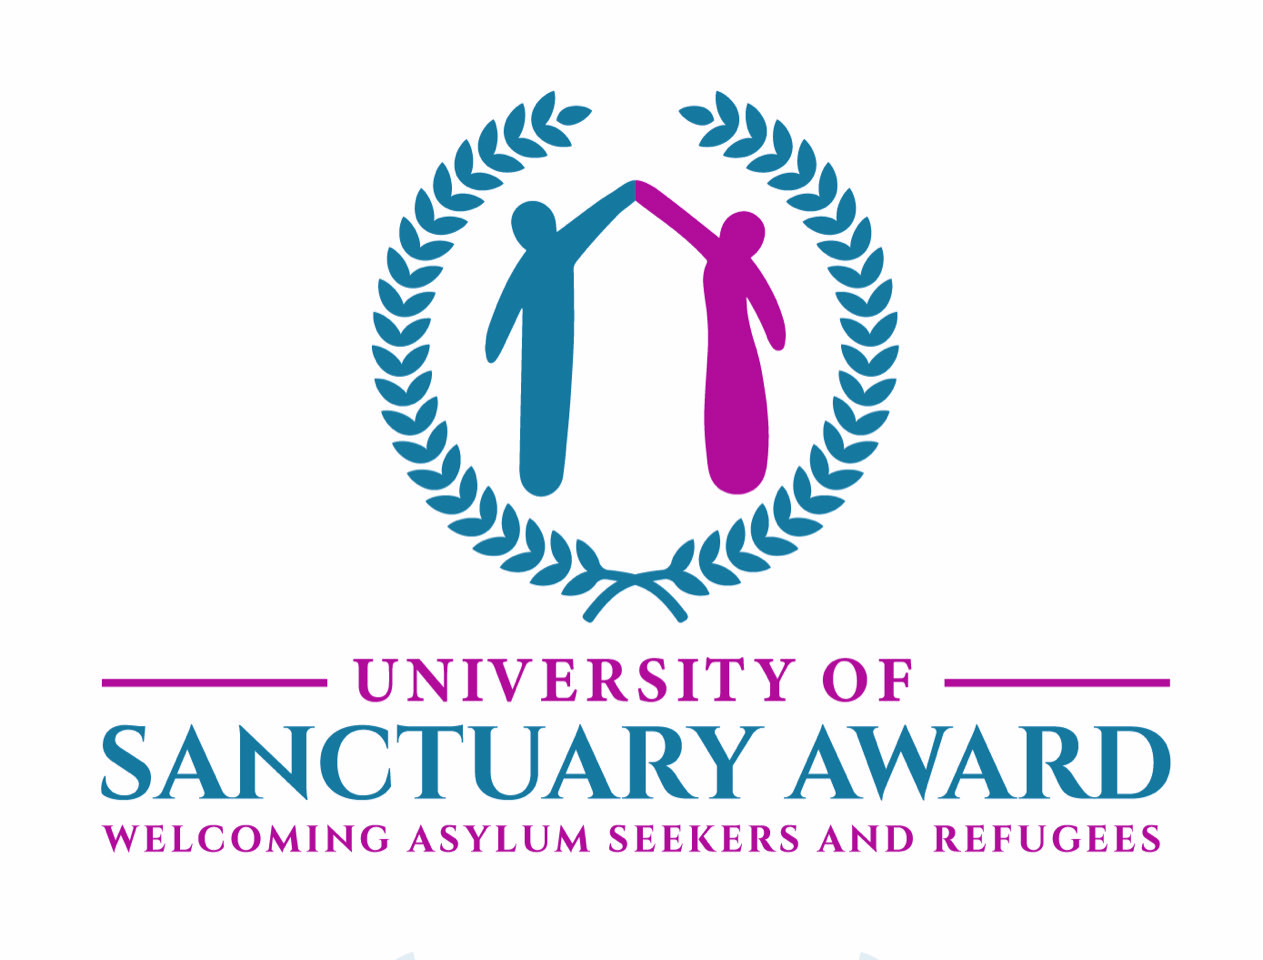 University of Sanctuary logo